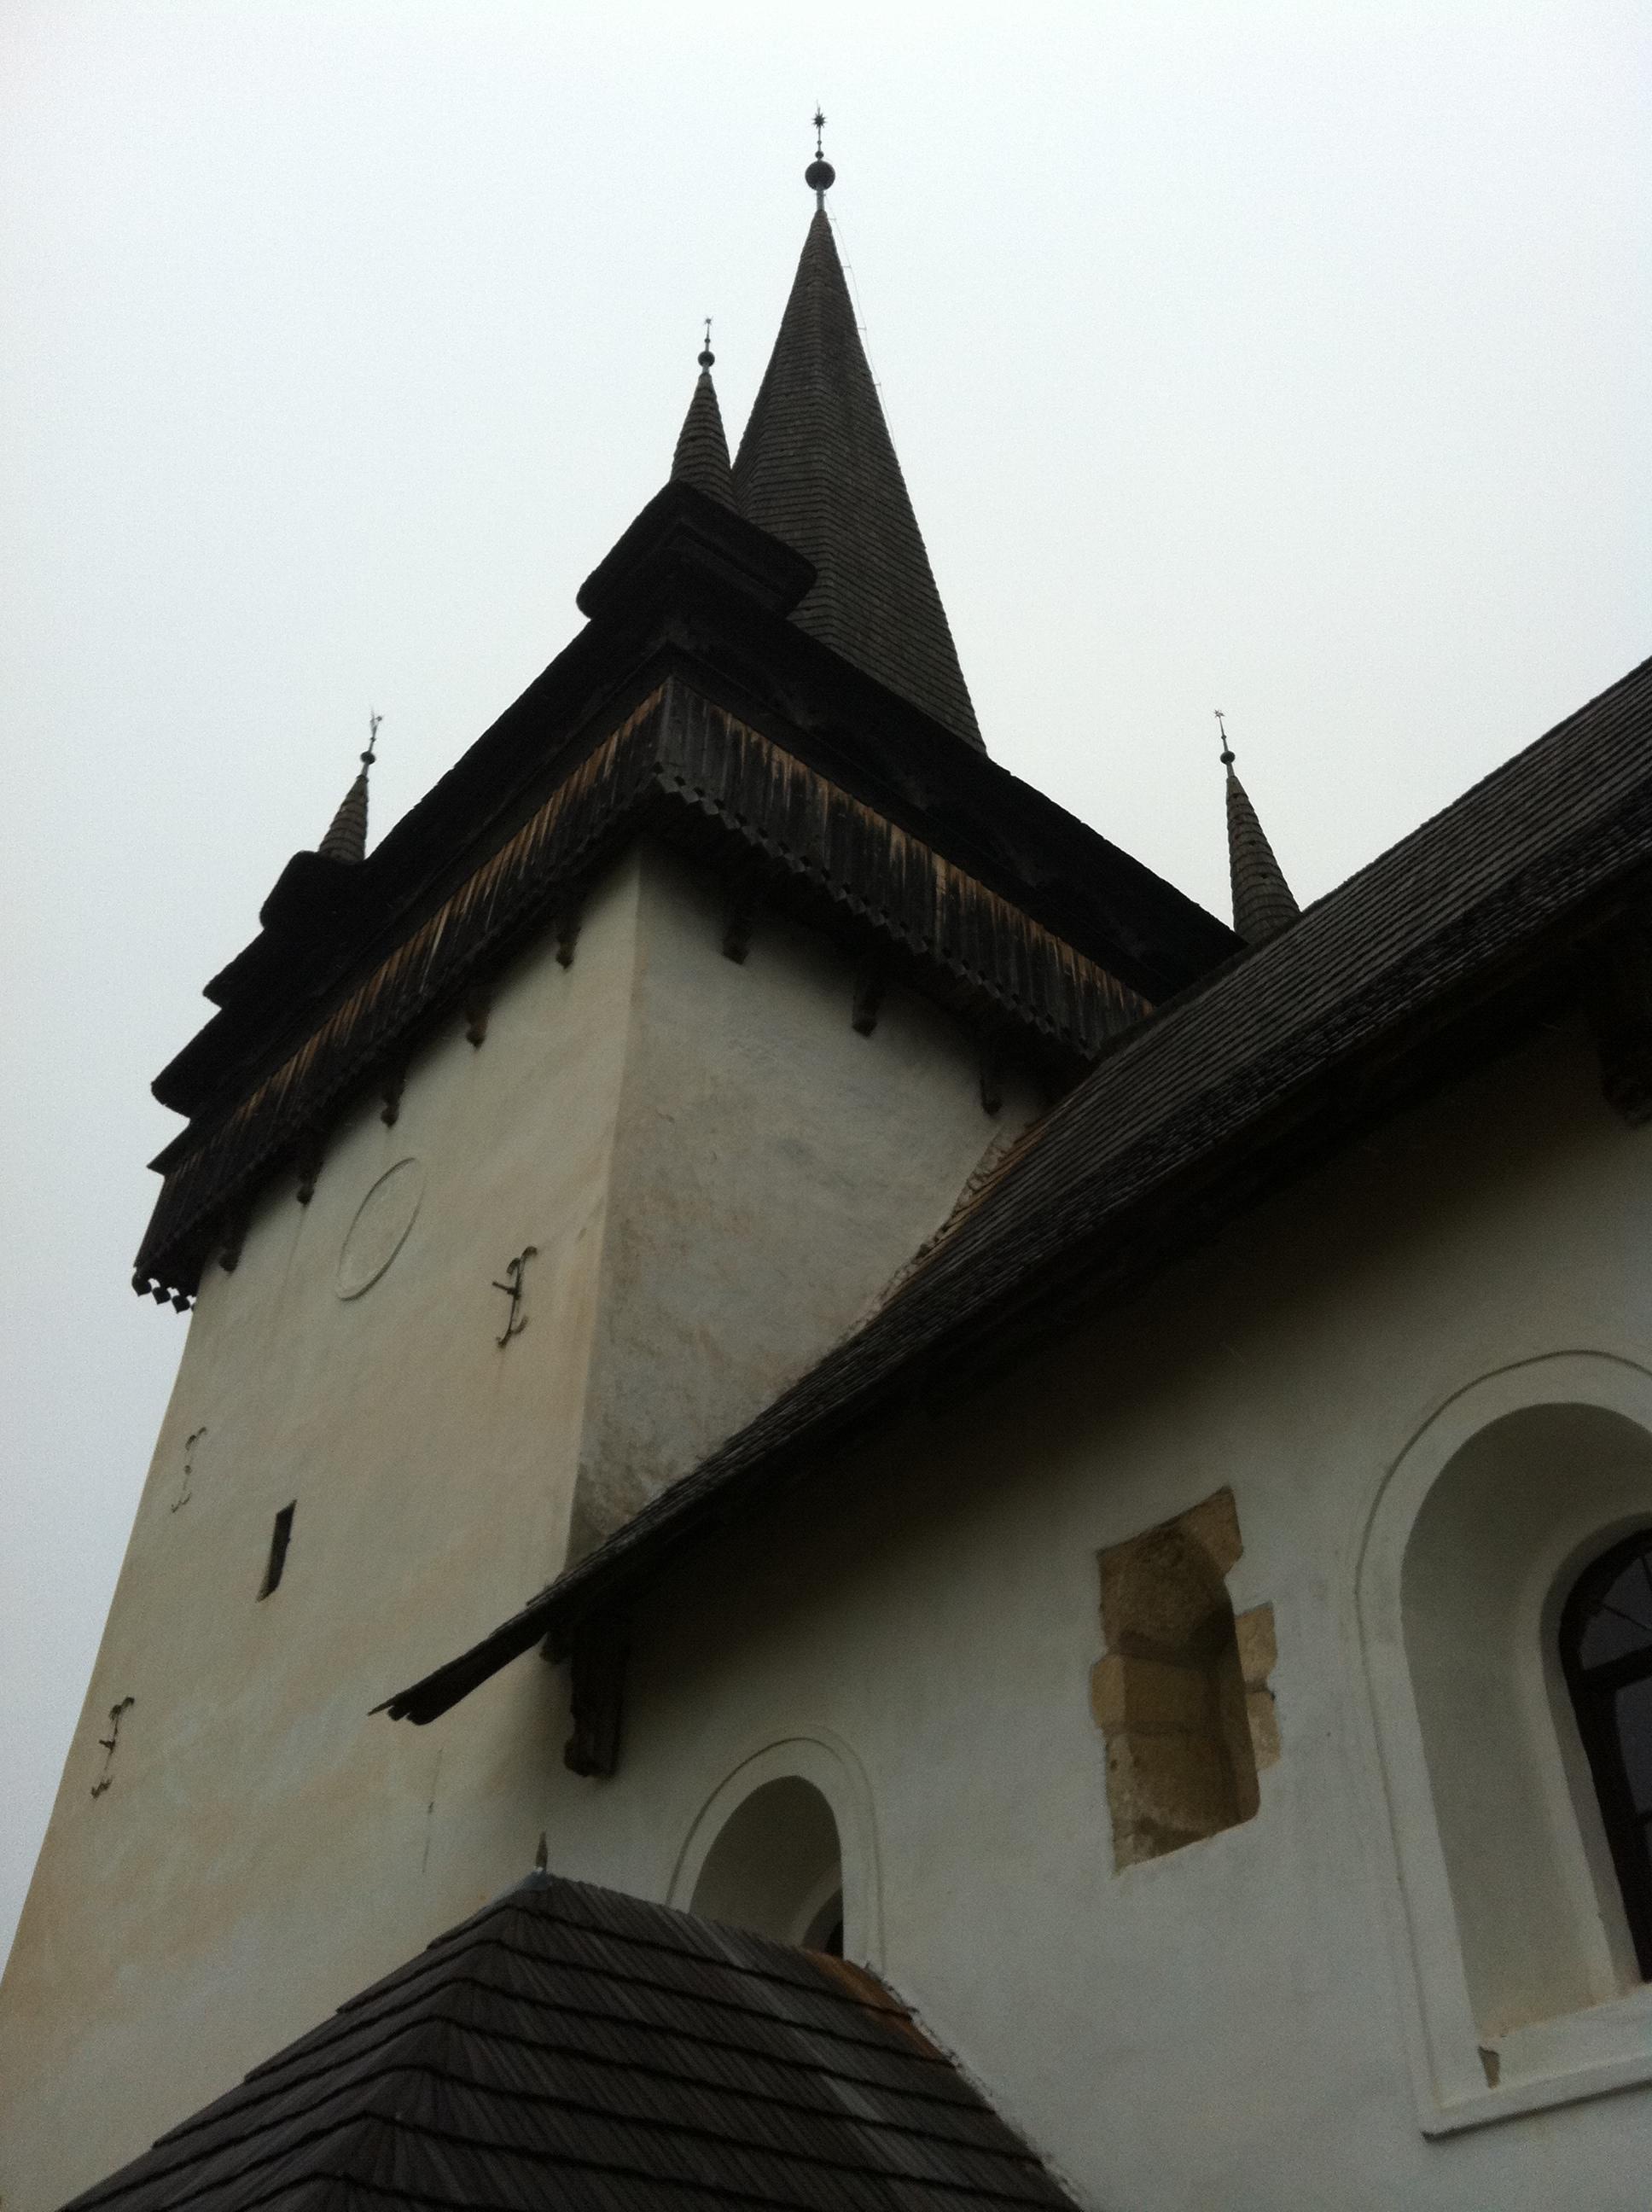 Steeple of the Reformed Church in  Văleni / Magyarvalkó.